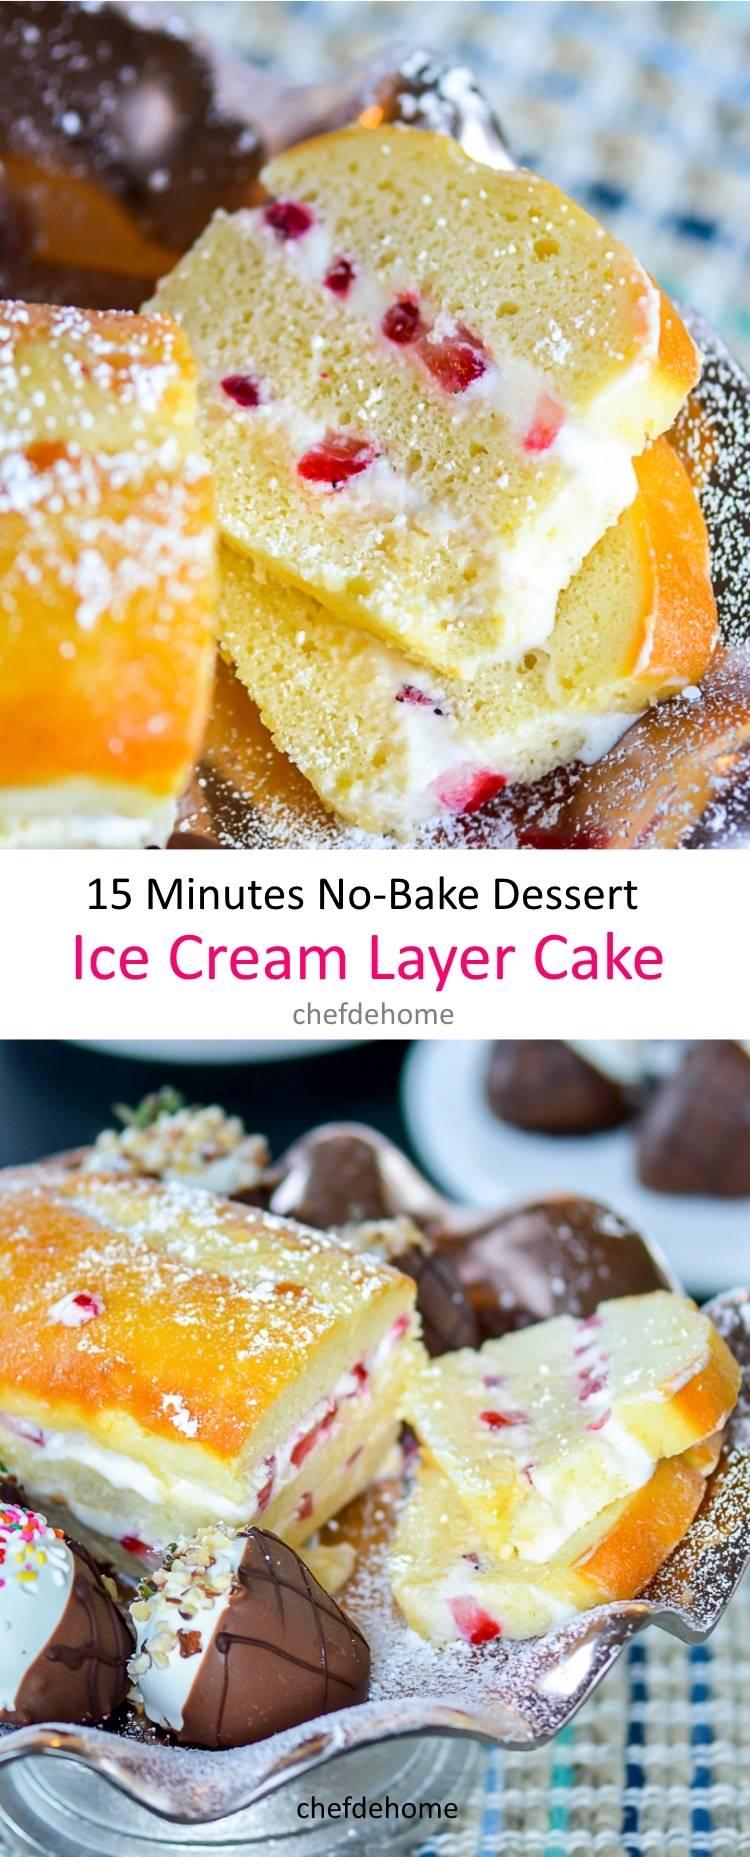 5 ingredients no-bake Ice Cream Layer Cake | chefdehome.com